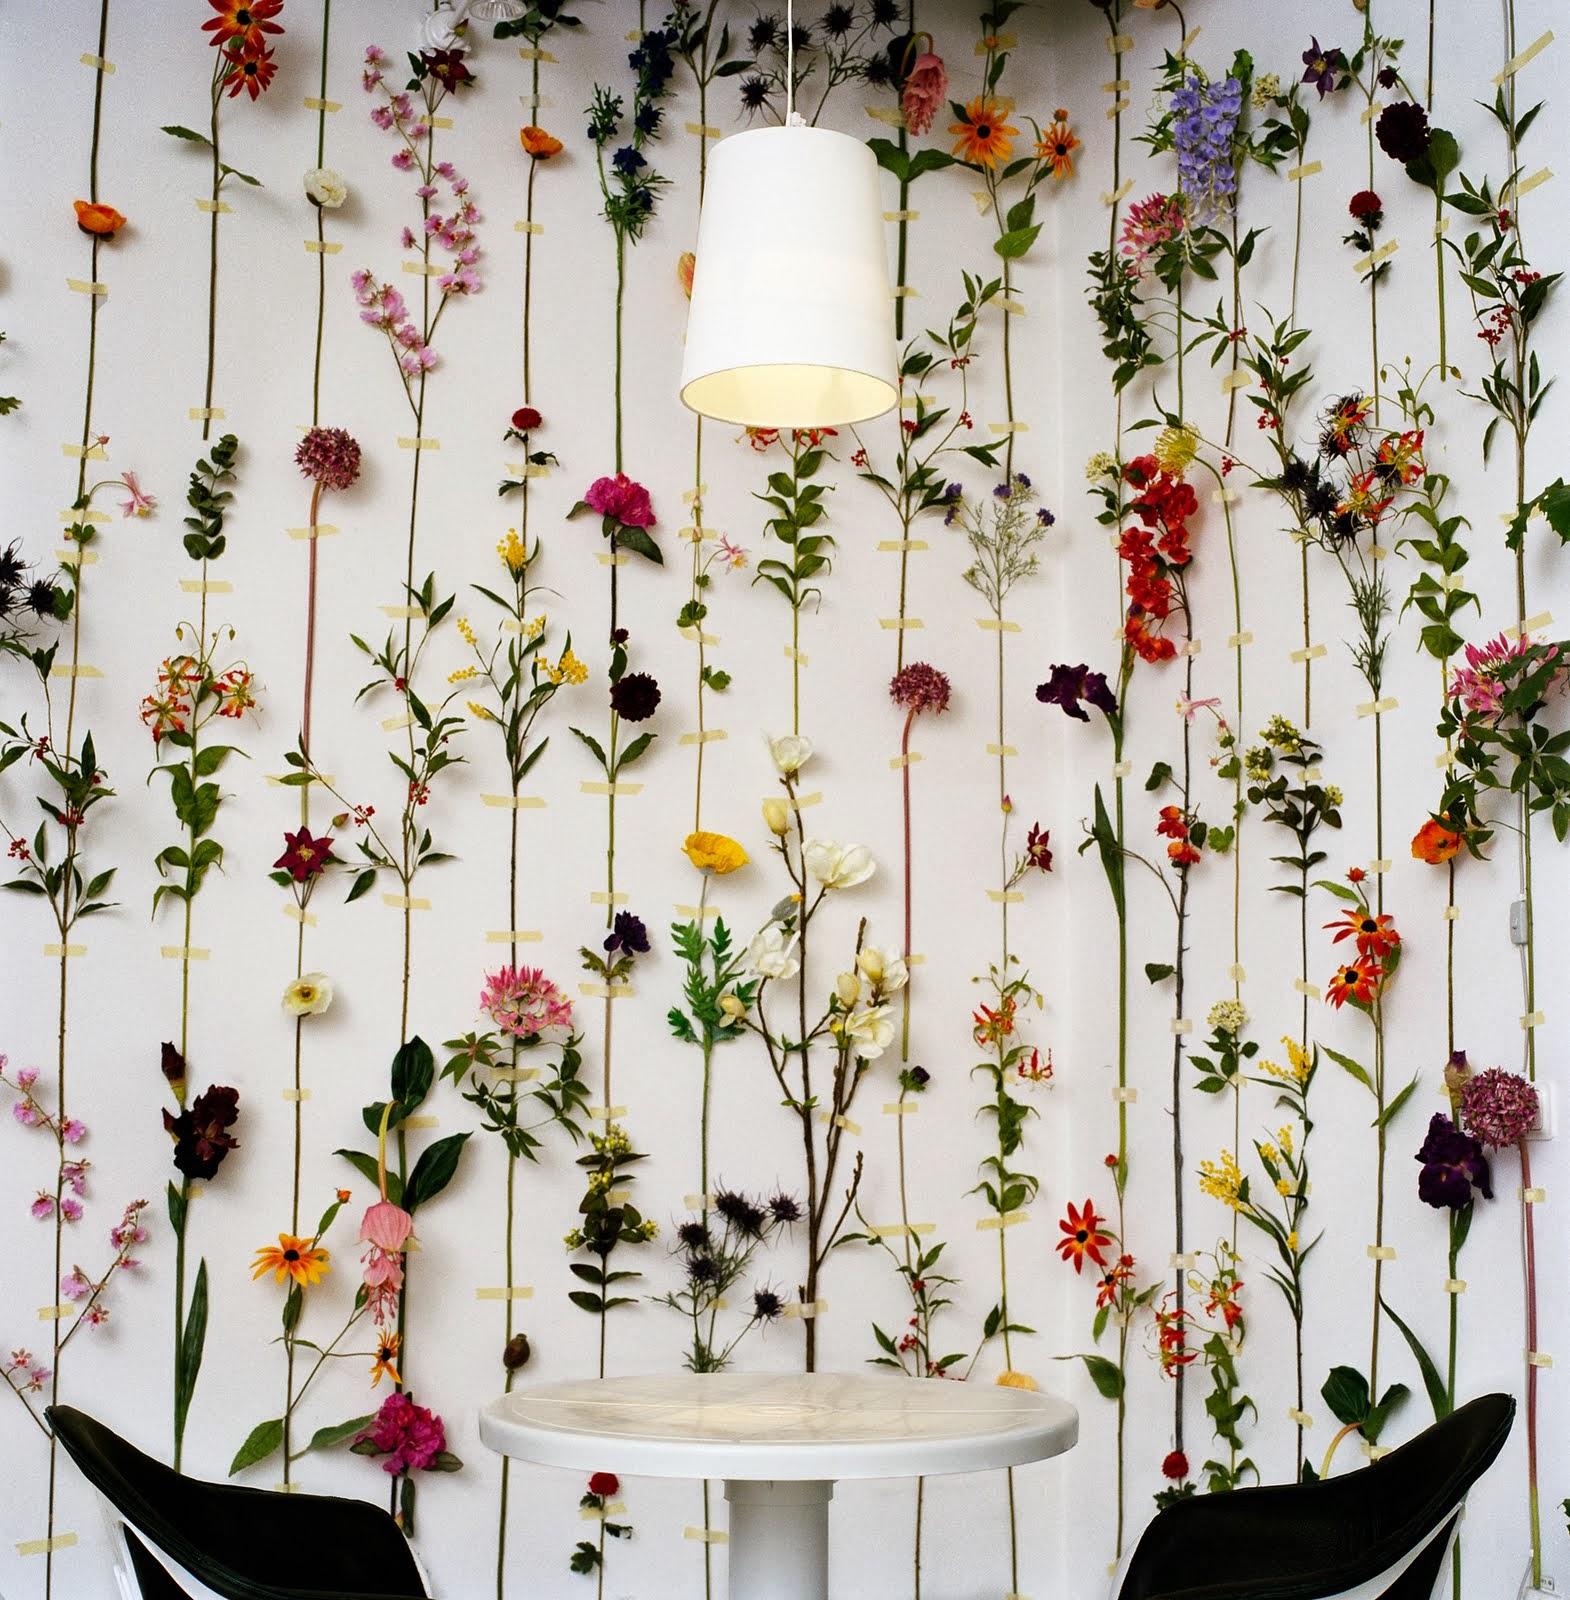 Vintage flower wallpaper - beautiful desktop wallpapers 2014 picture wallpaper (1570 x 1600 )